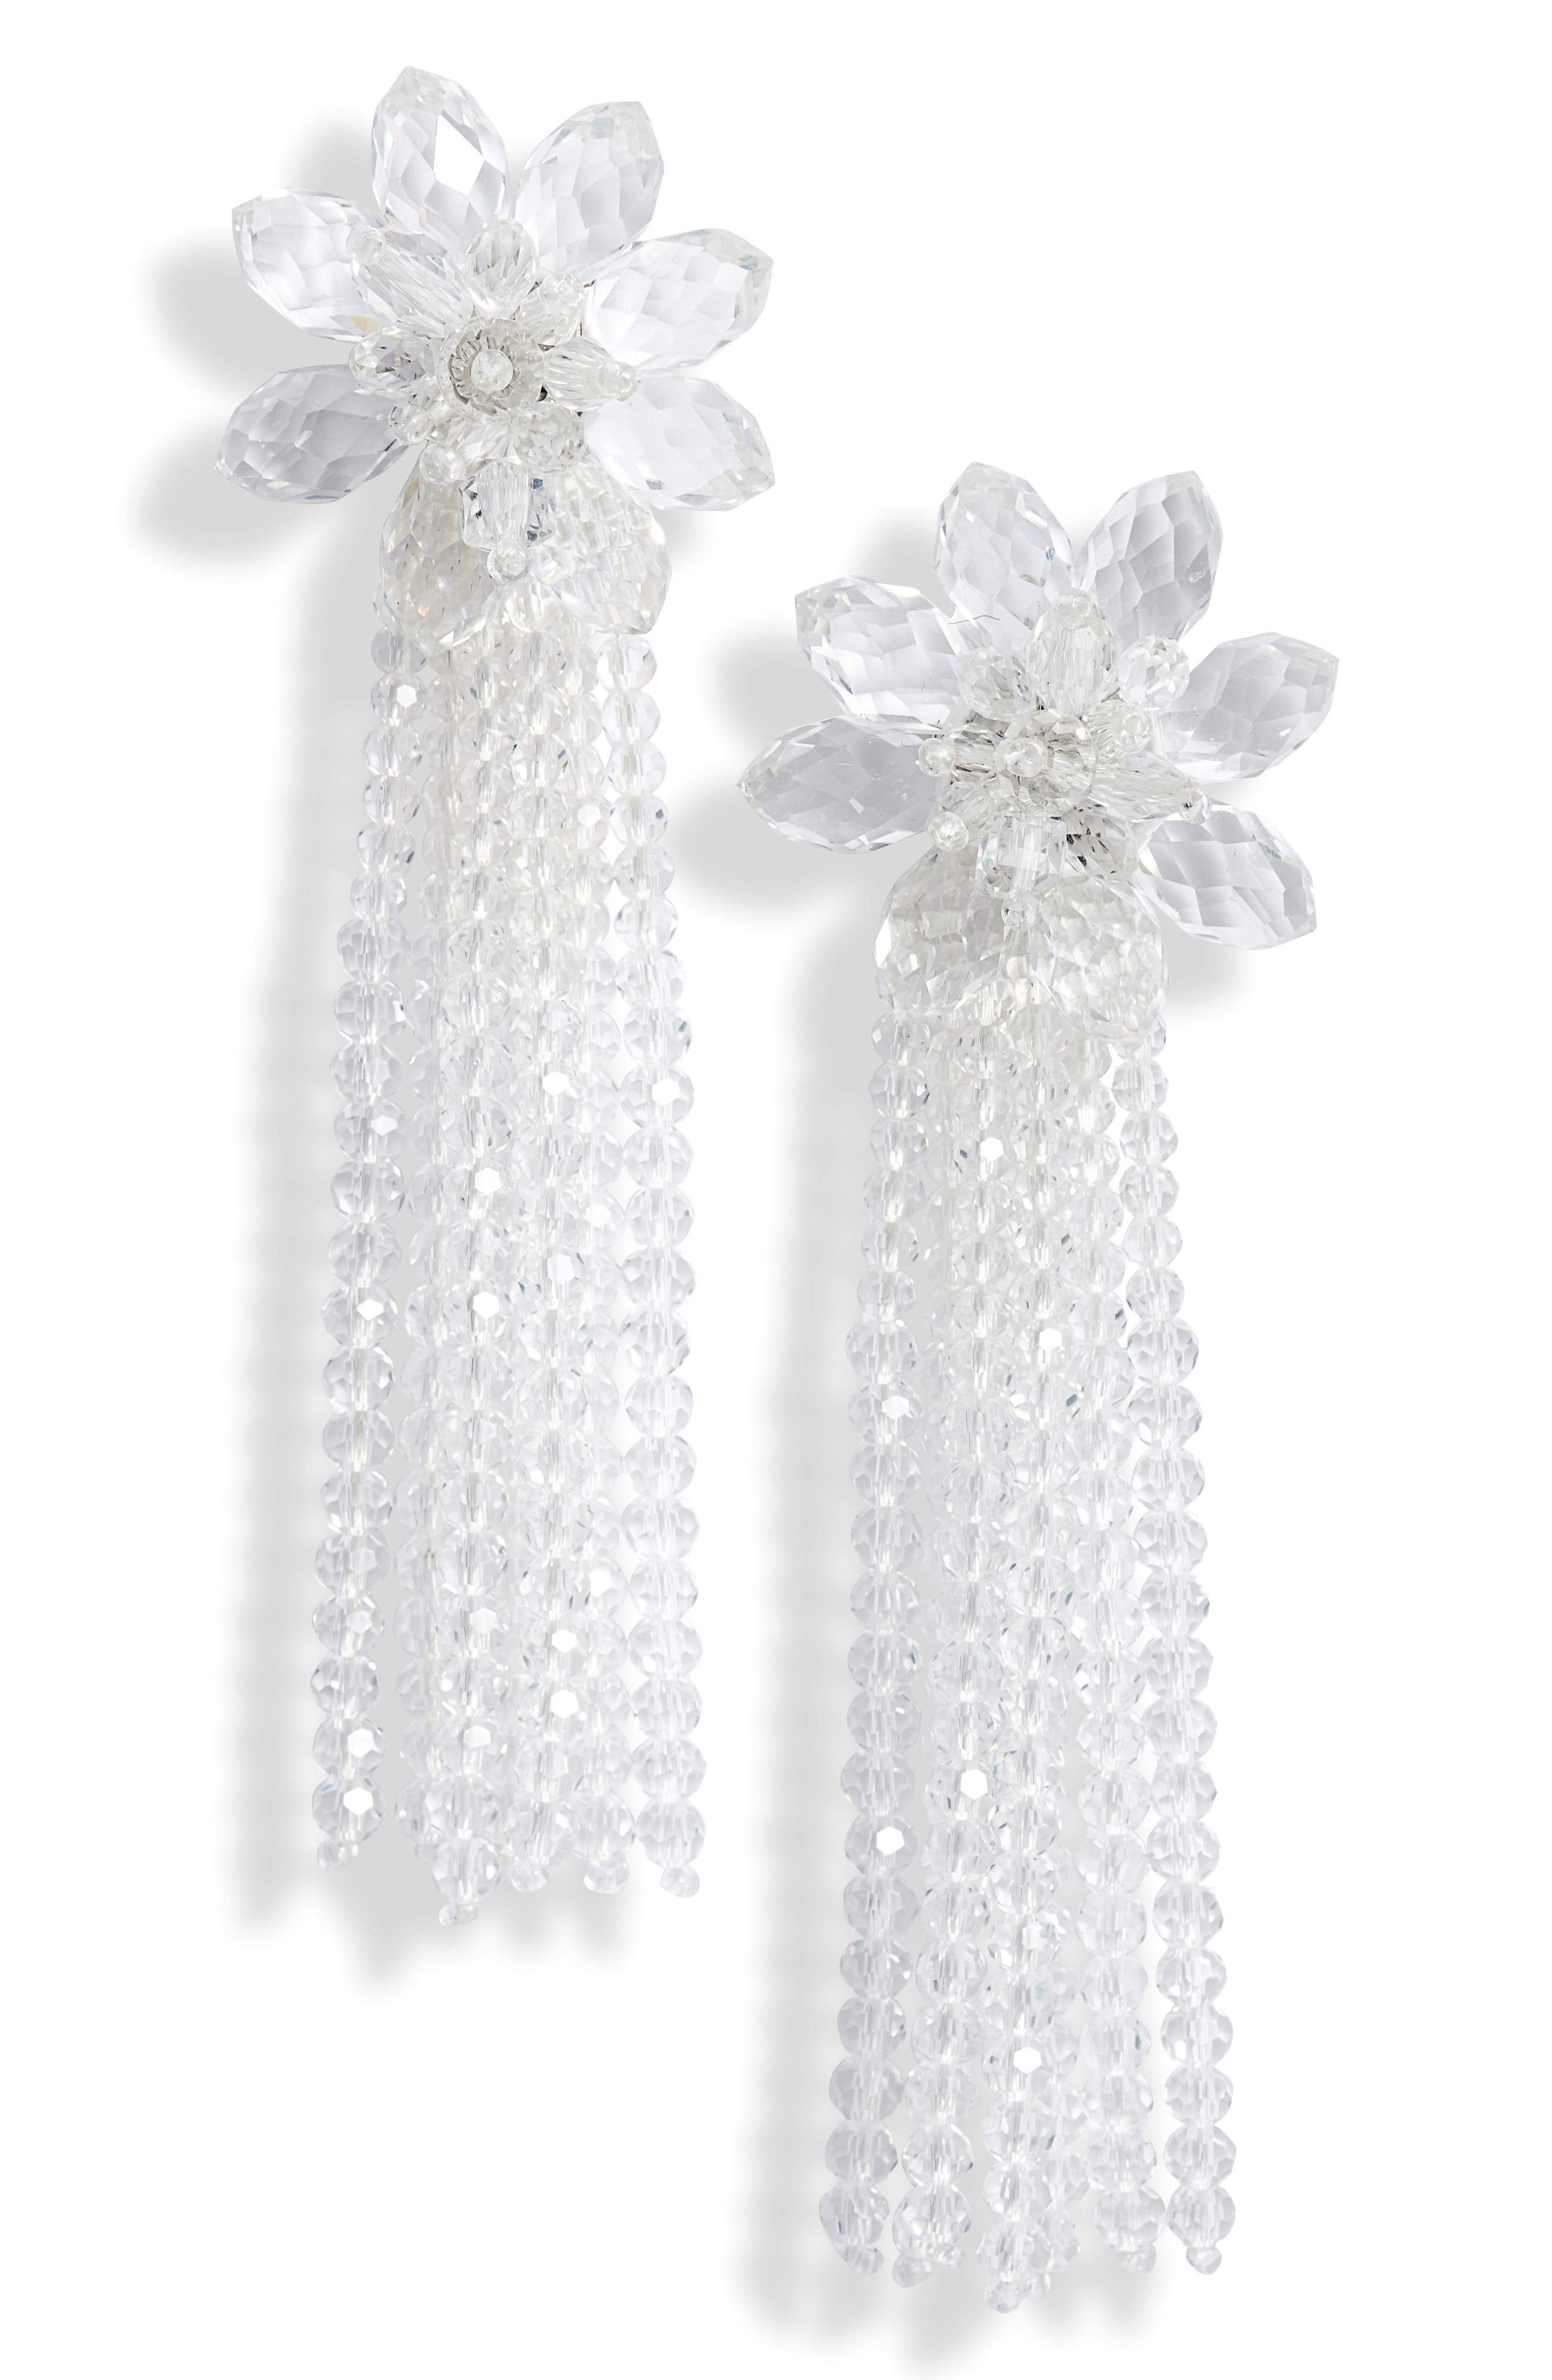 KATE SPADE NEW YORK,                             statement crystal tassel drop earrings,                             Main thumbnail 1, color,                             CLEAR